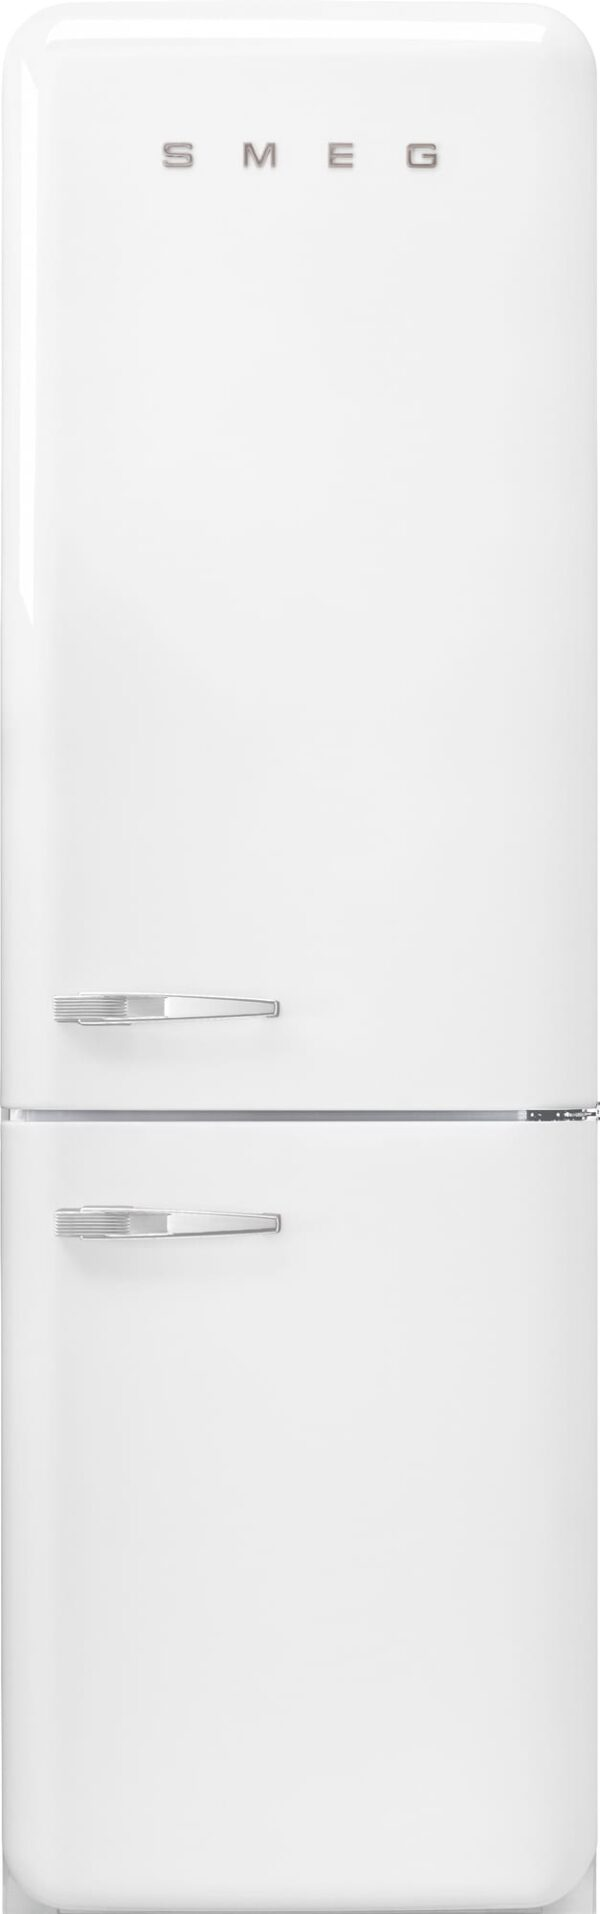 Smeg 50's Style kølefryseskab FAB32RWH5 (hvid)